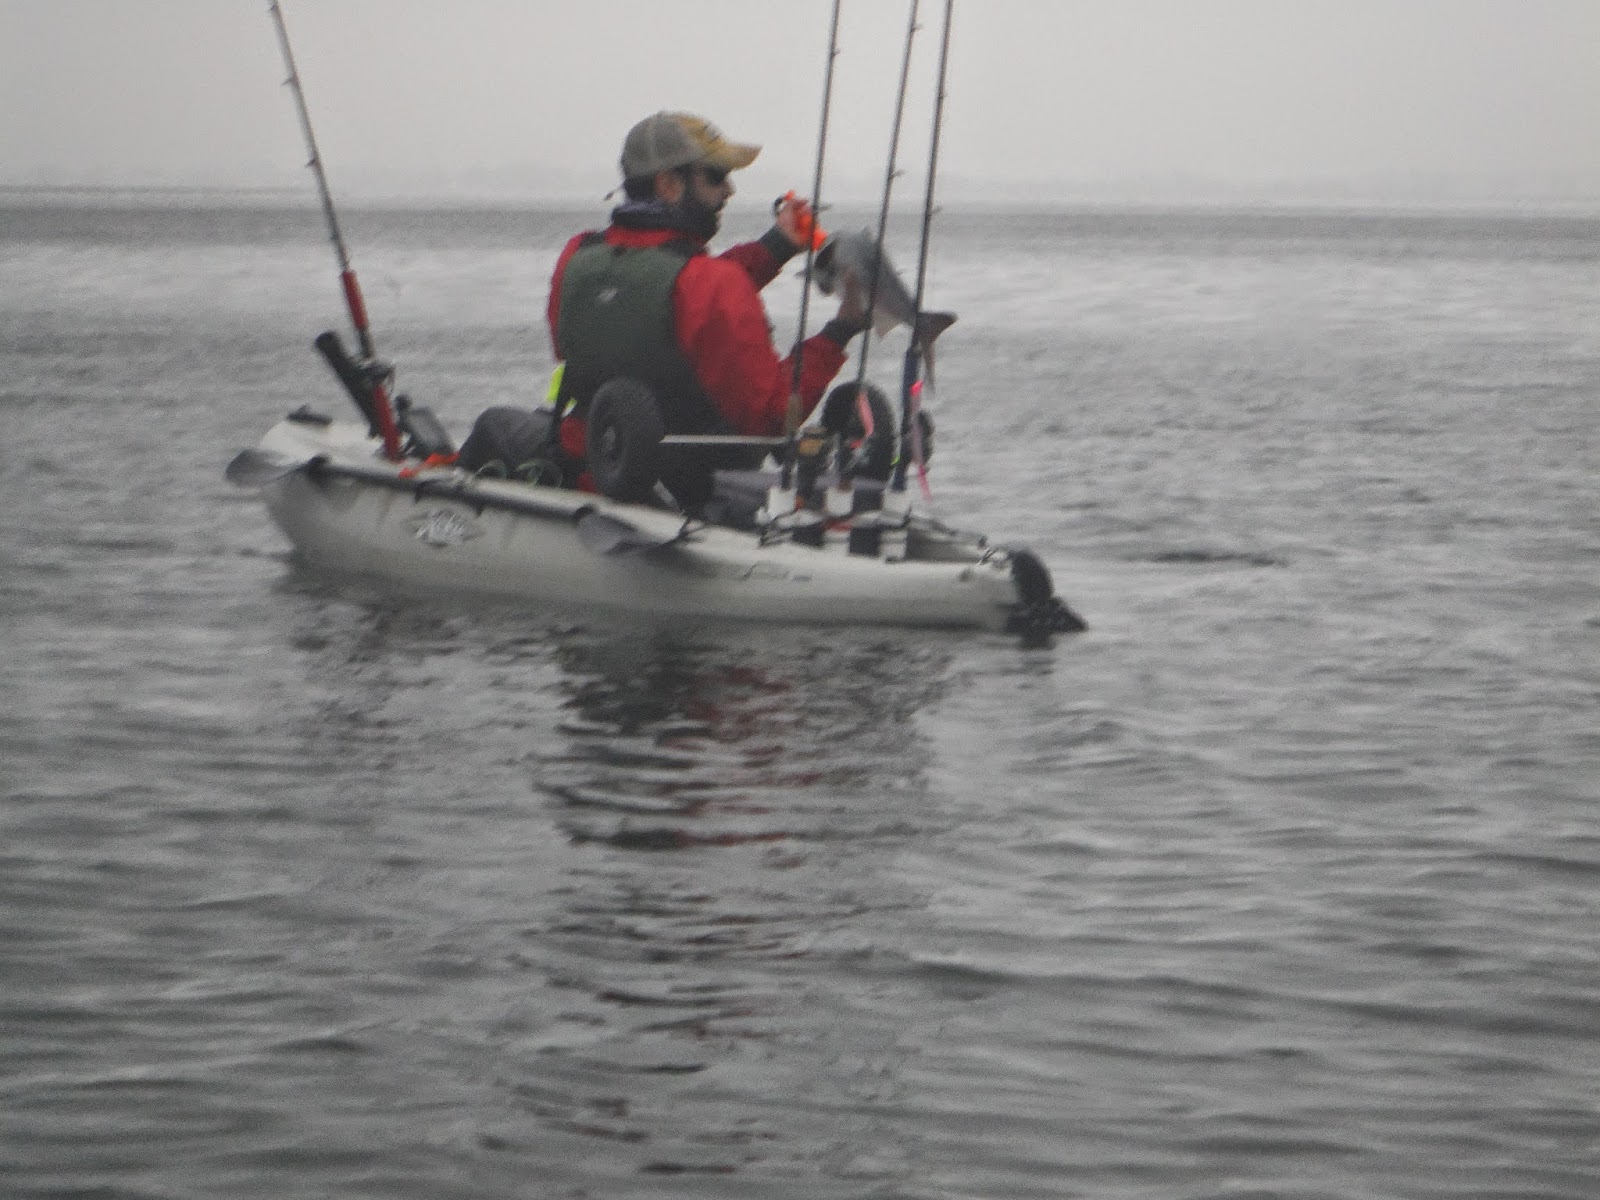 Long island kayak angler 2014 kayak fishing classic at for Kayak fishing tournaments near me